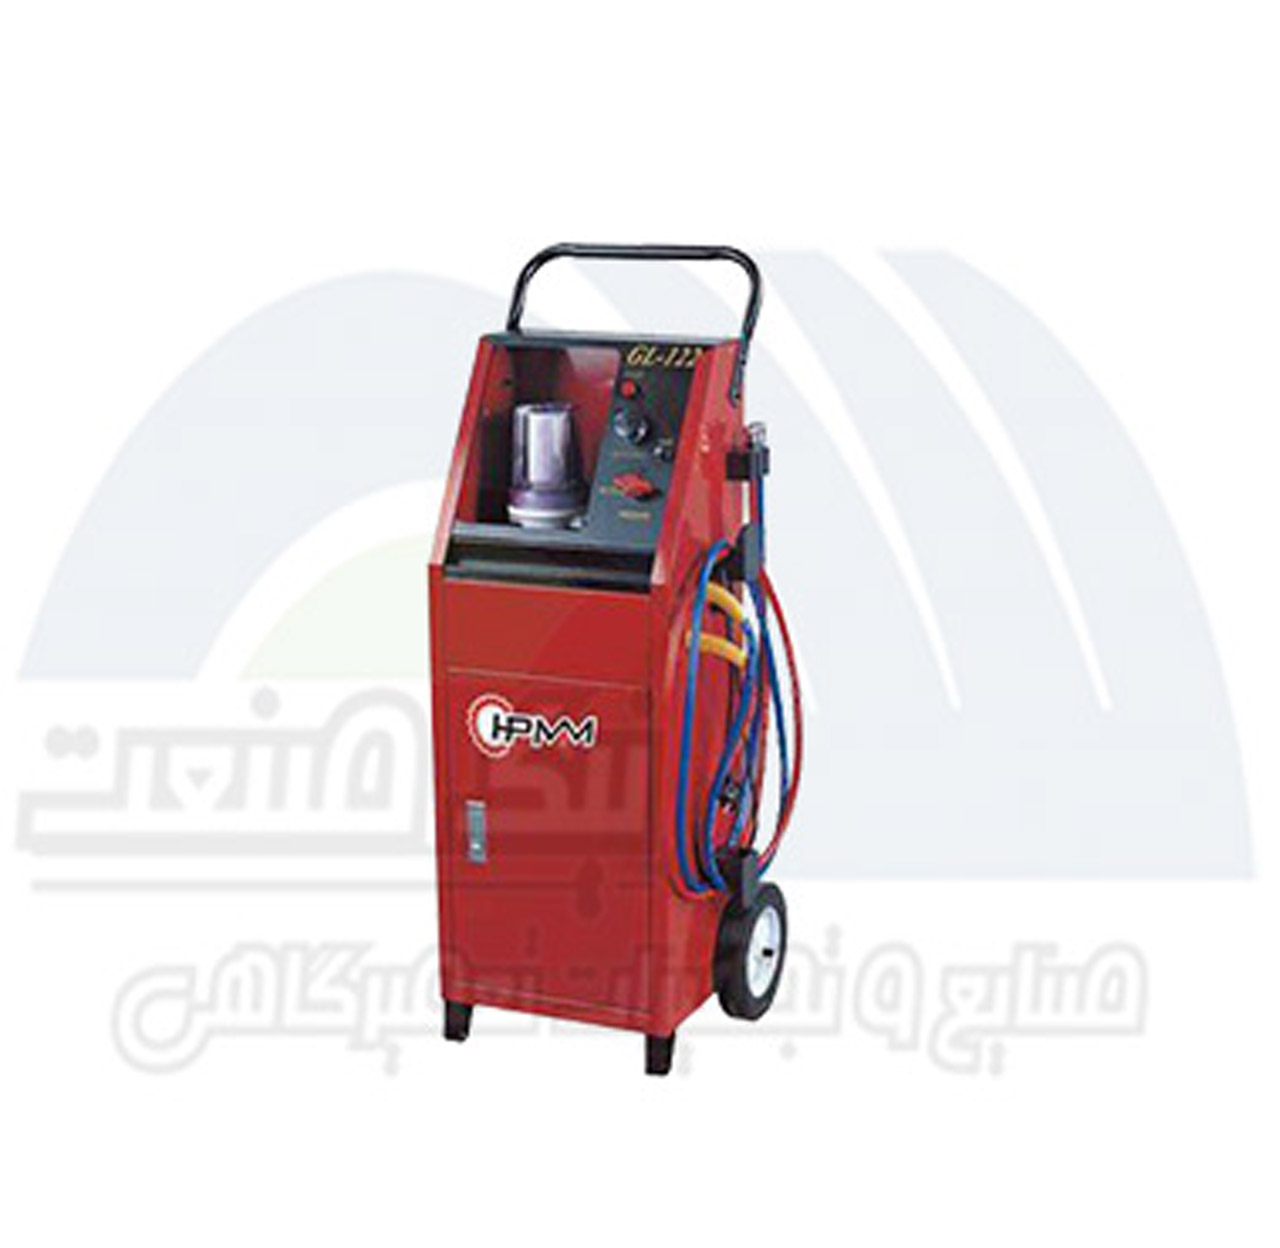 دستگاه شستشوی سیستم روغنکاری موتور HPMM GL-122